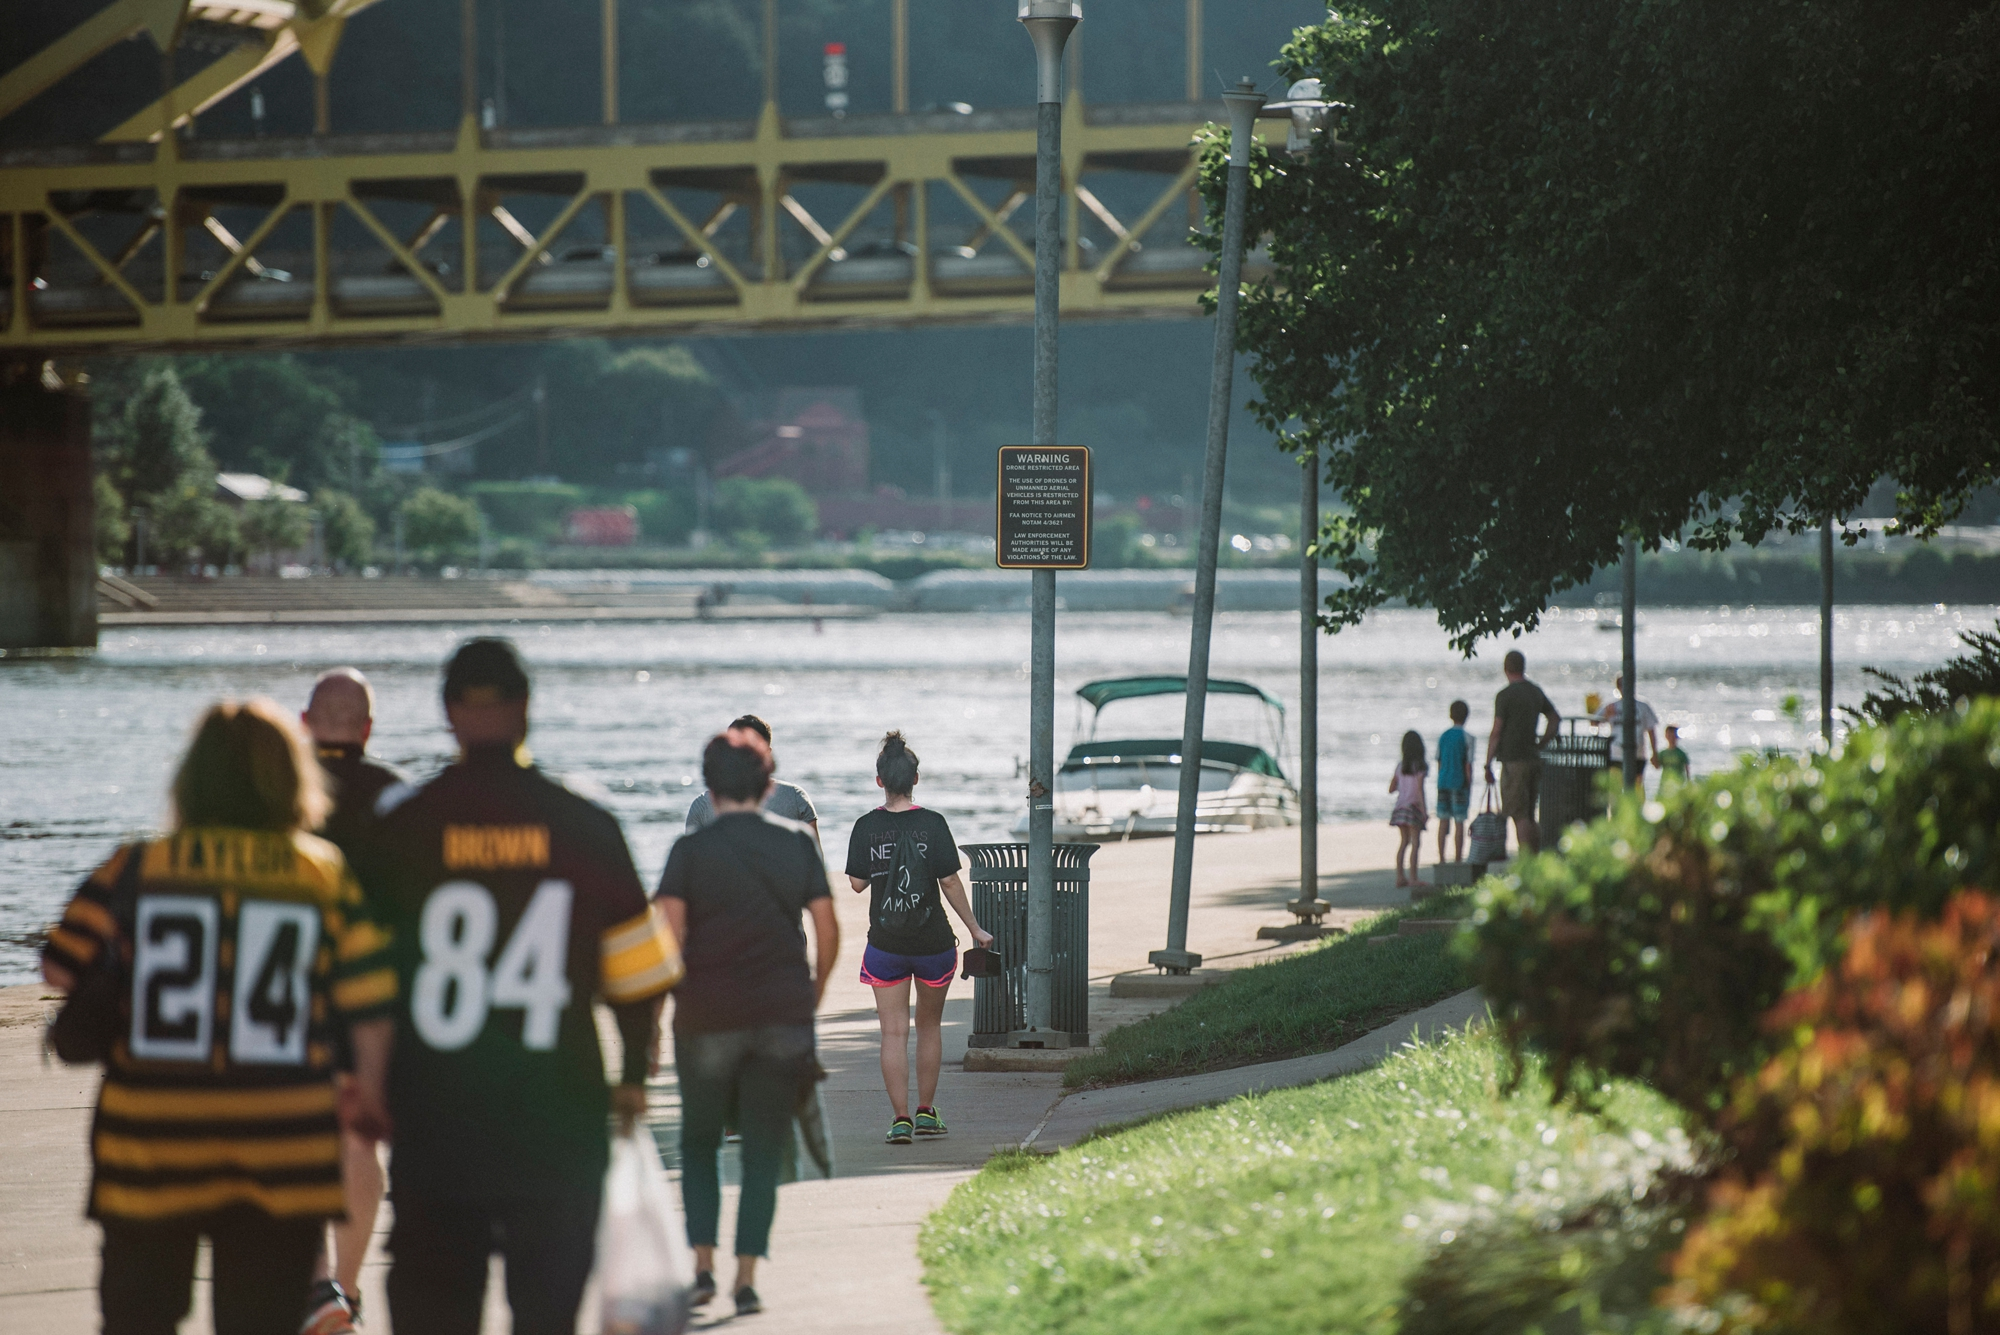 0097Jorge-Clara-Proposal-Pittsburgh_Proposal-Pittsburgh-Constructed-Adventures-Sandrachile.jpg